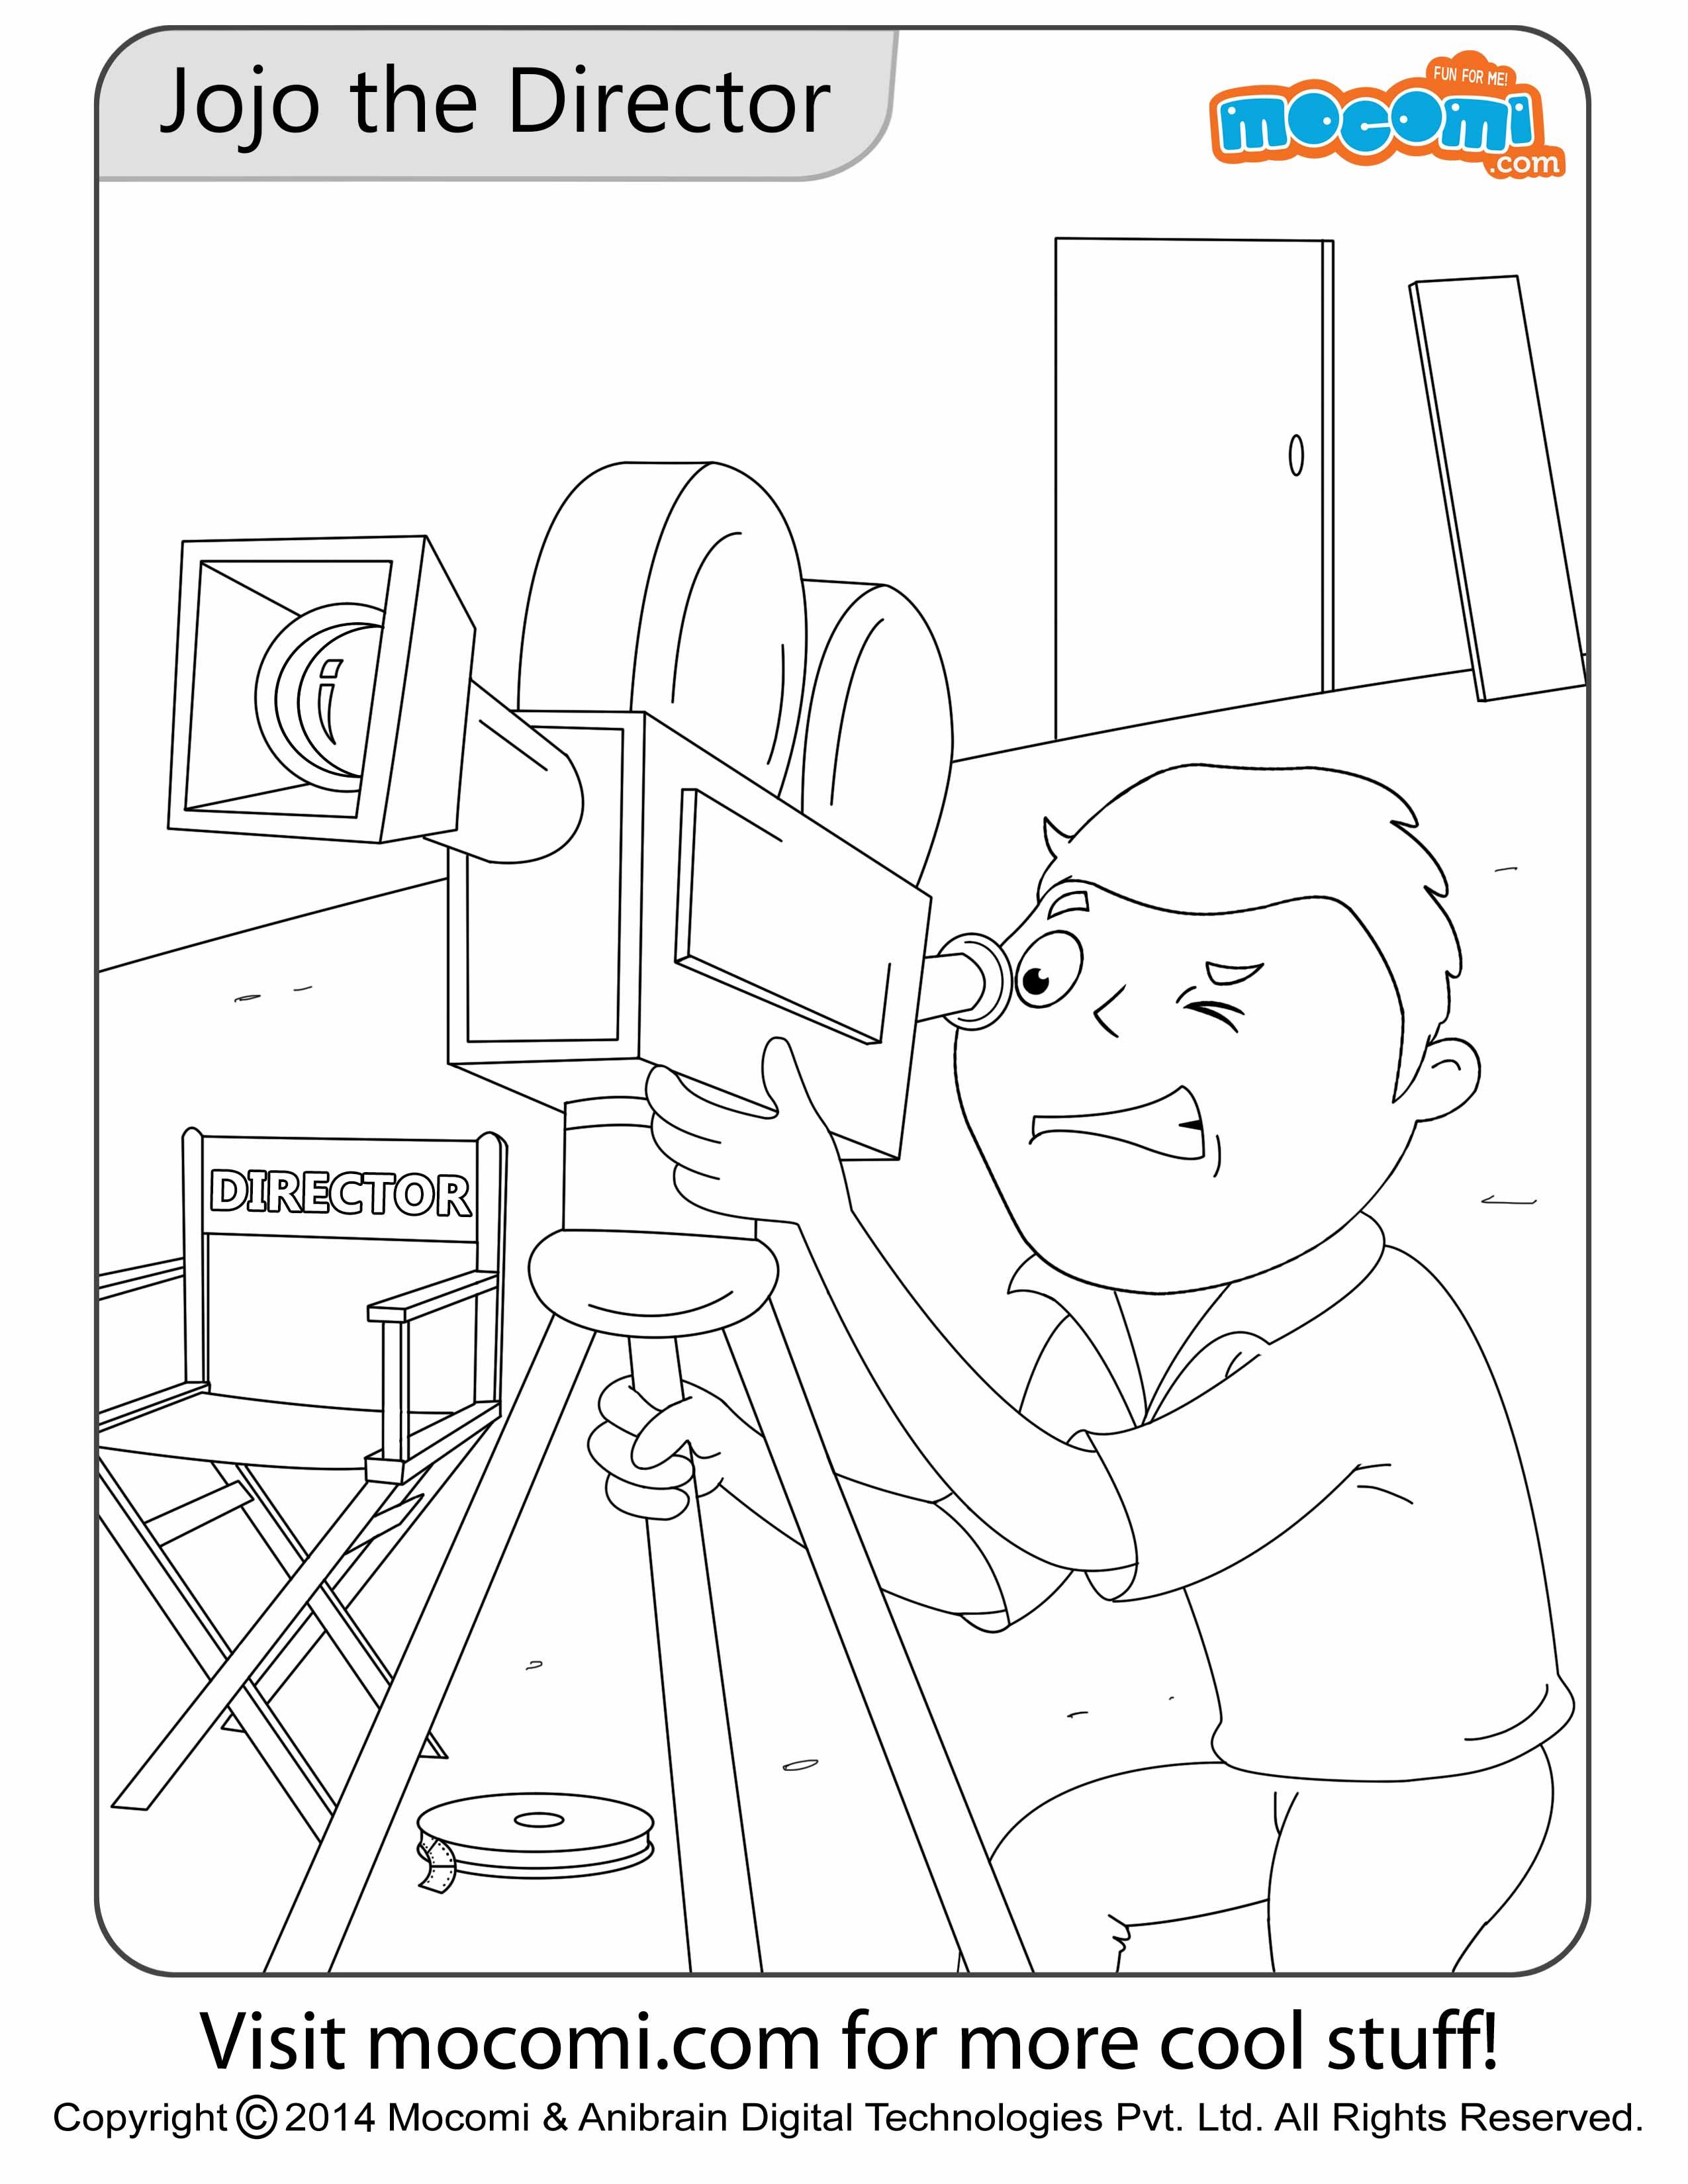 Jojo the Director